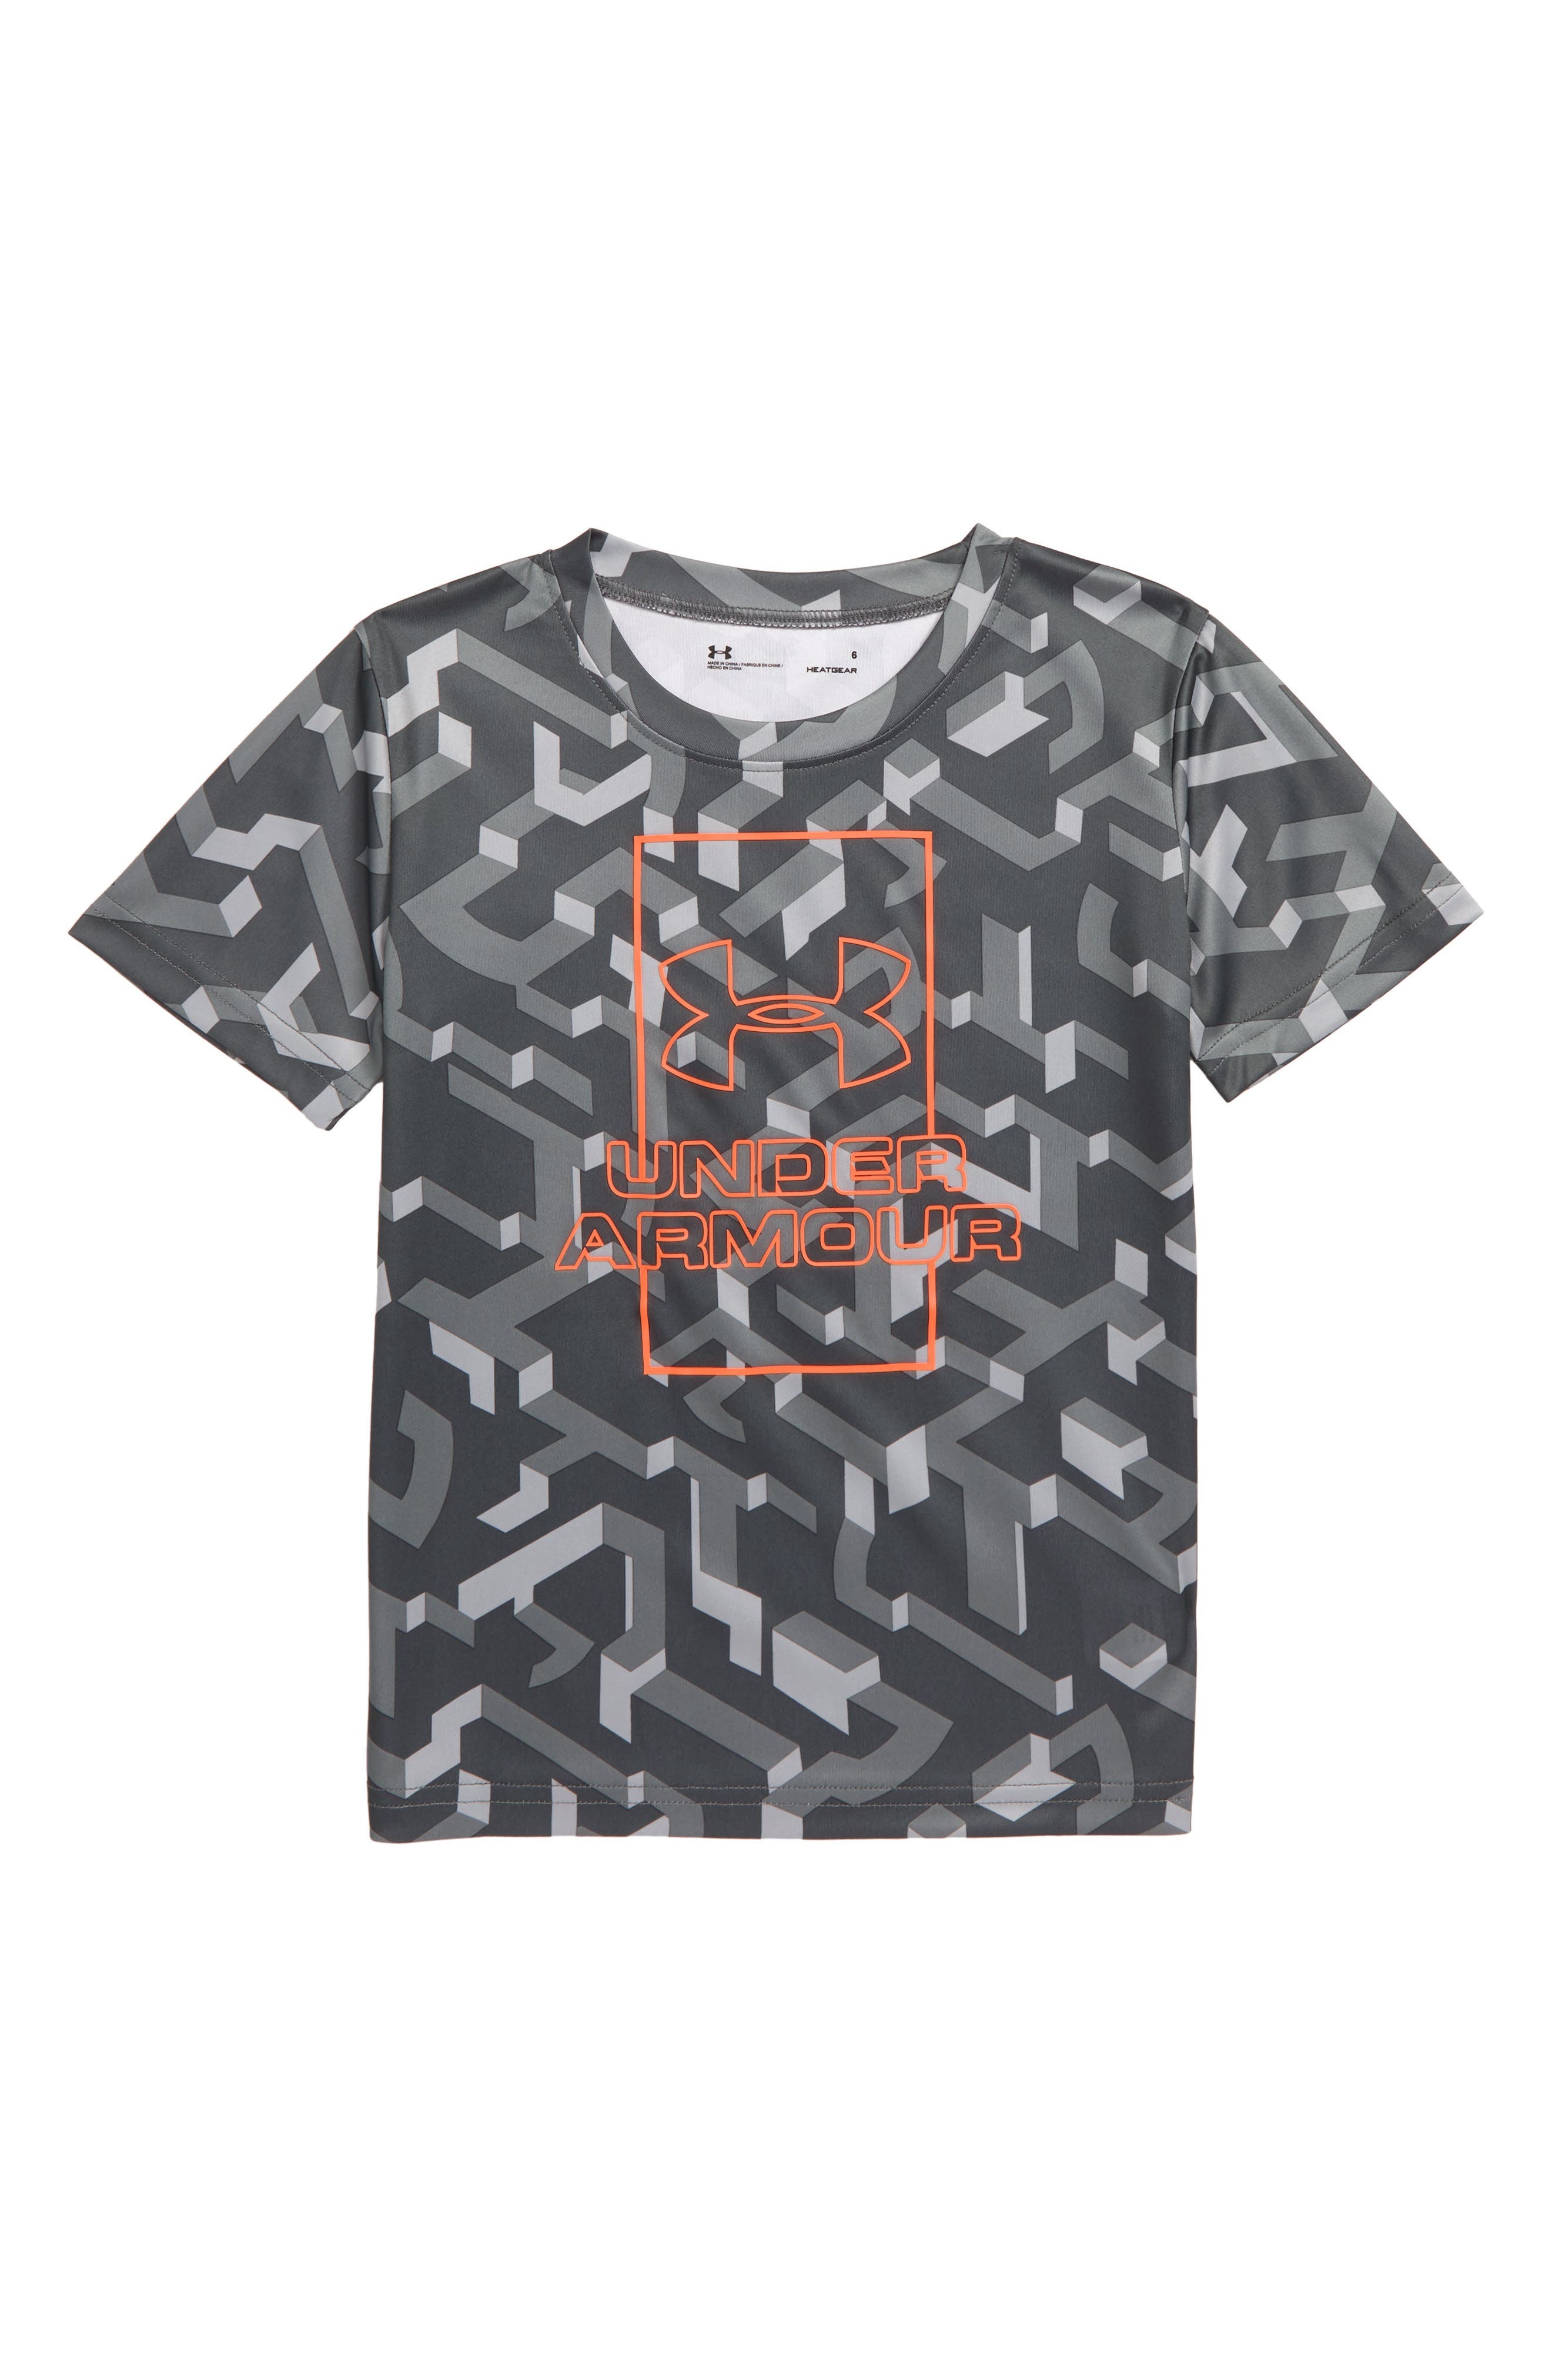 UNDER ARMOUR, Knockout HeatGear<sup>®</sup> T-Shirt, Main thumbnail 1, color, MOD GRAY